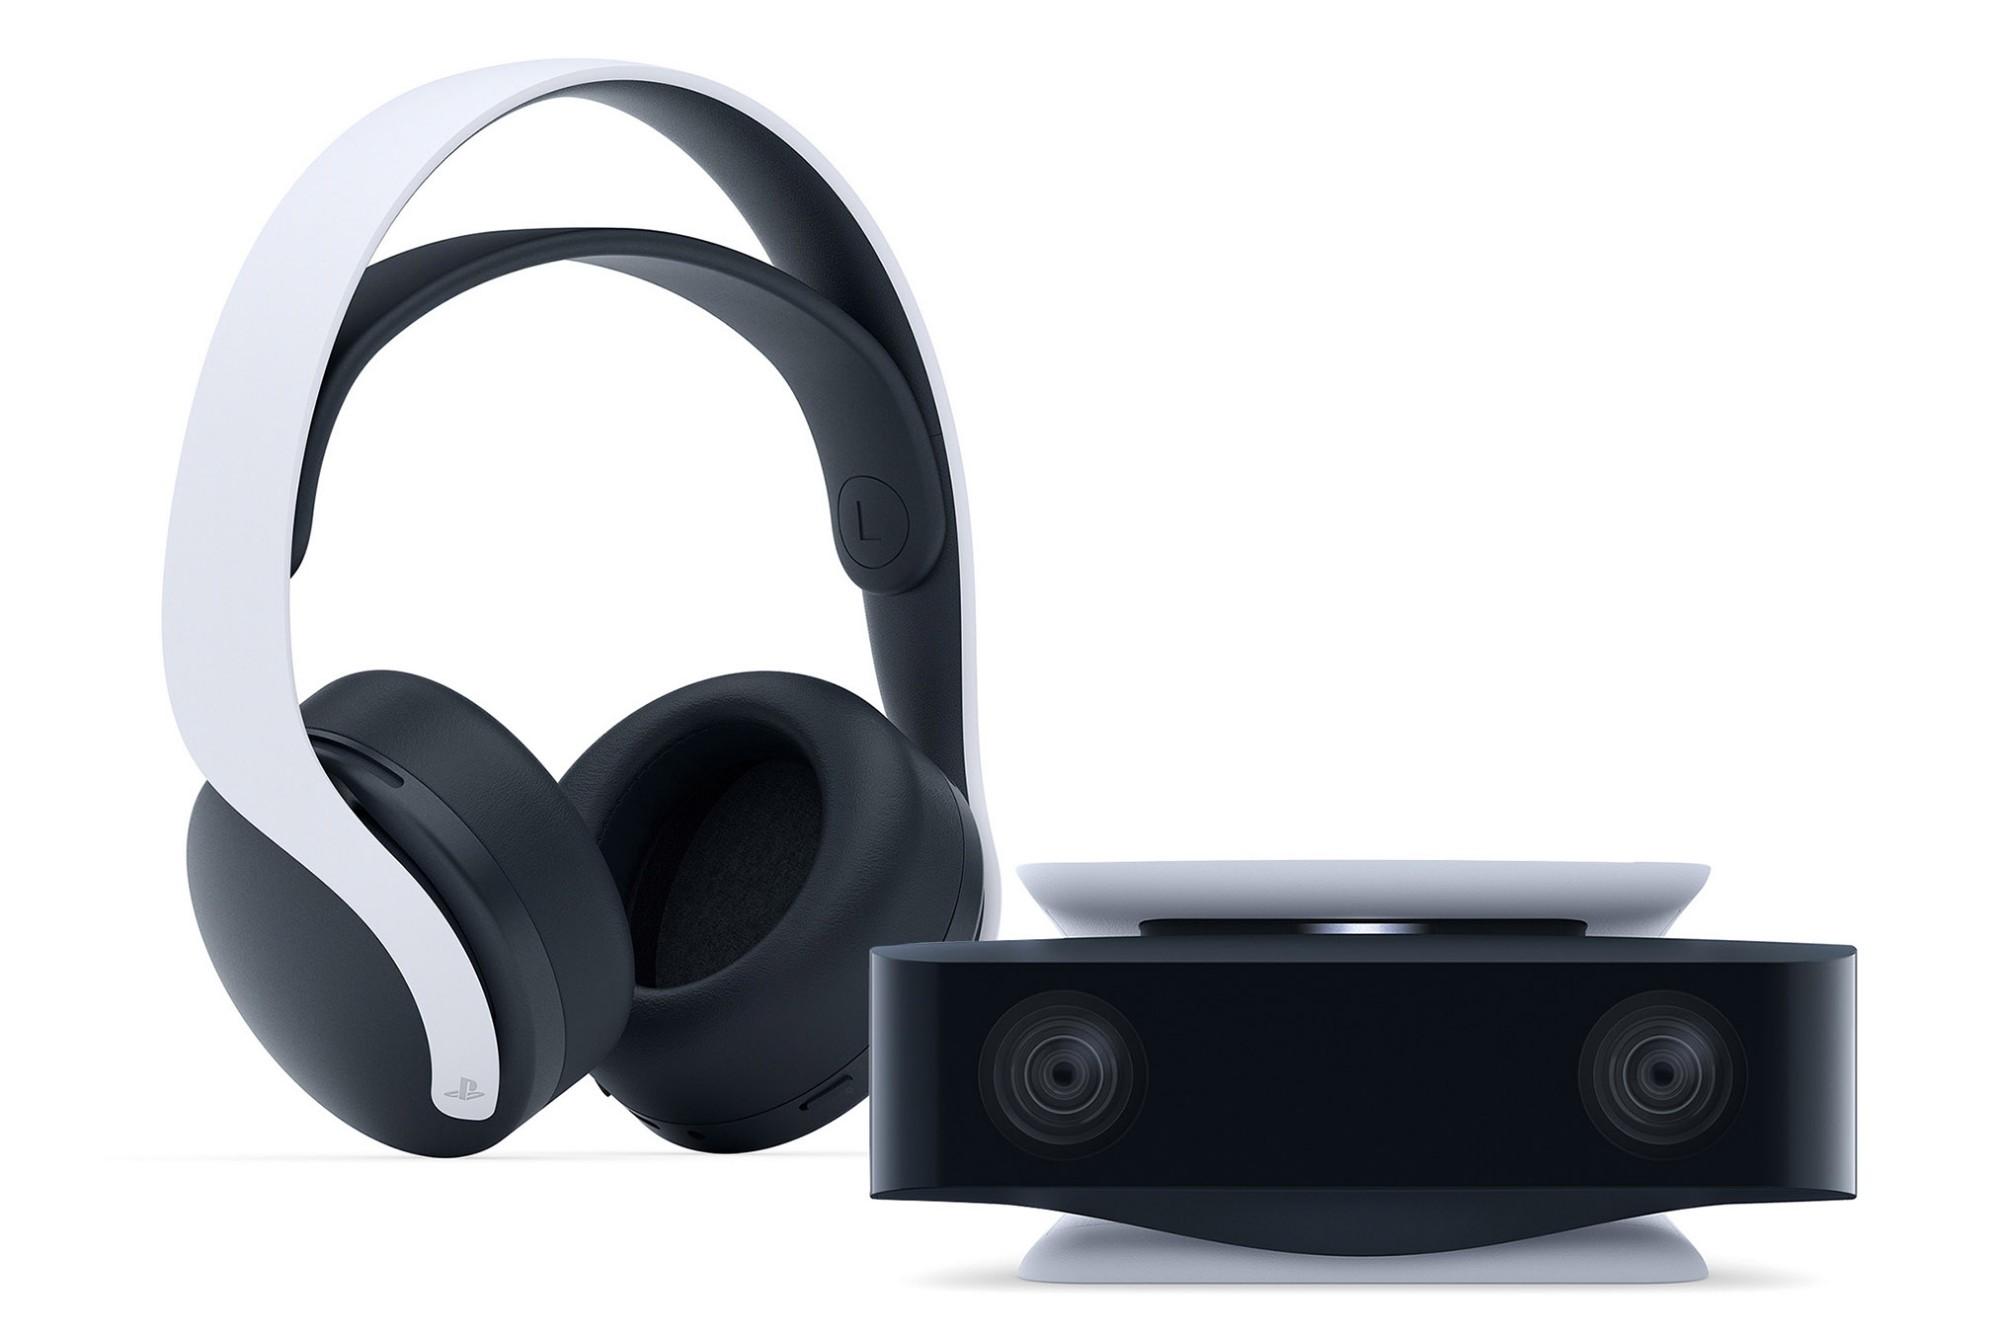 Sony PlayStation 5 Pulse 3D Wireless Headset & HD Camera Bundle